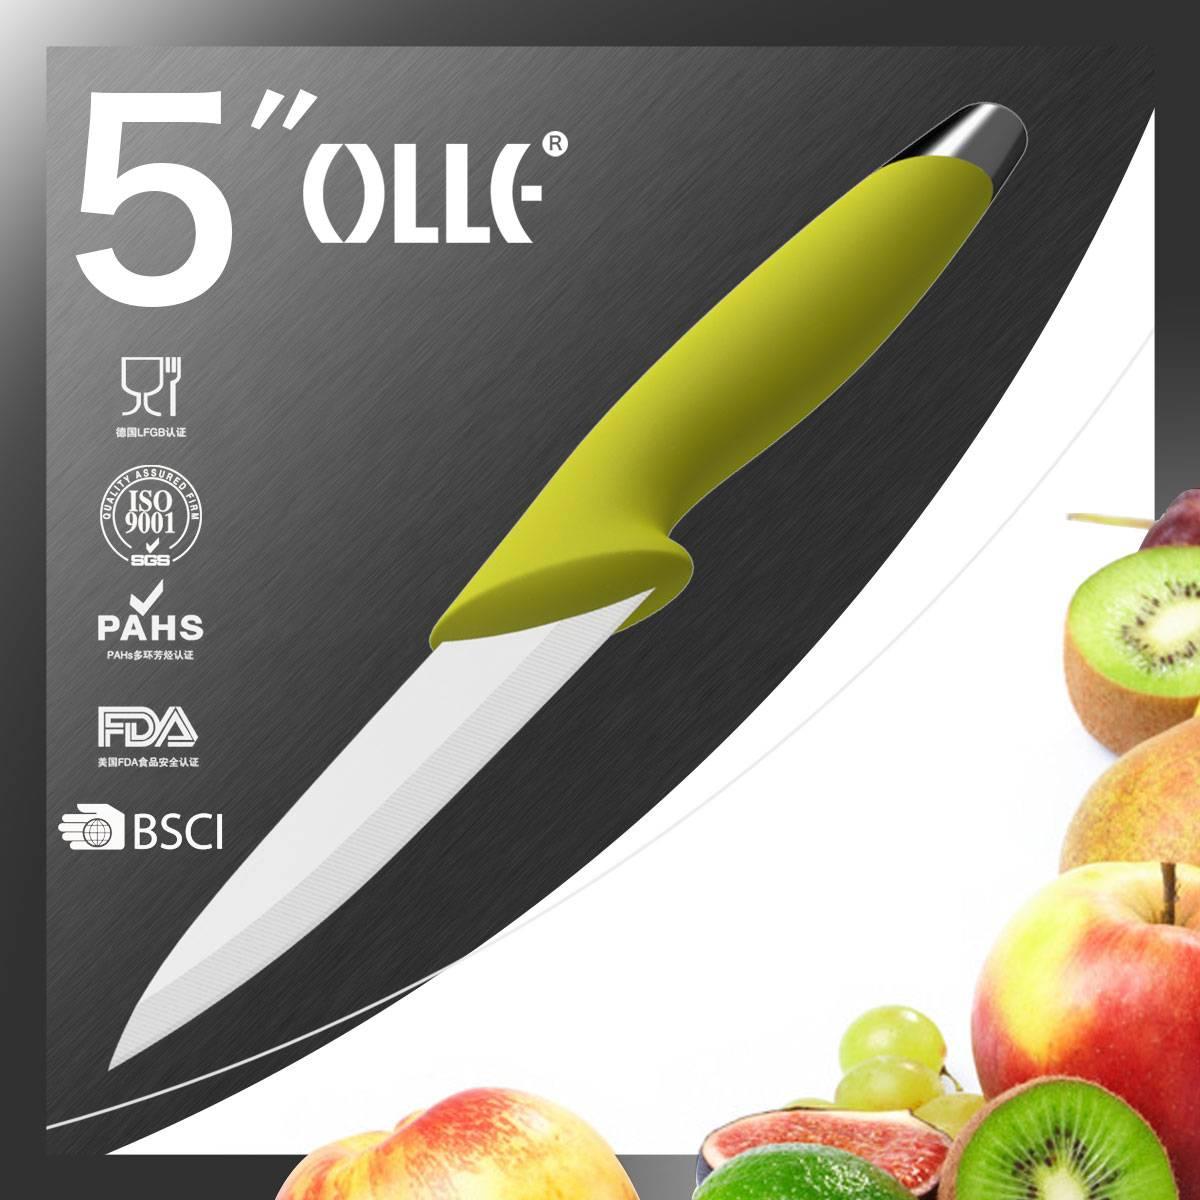 Promotional Kitchen Item 5 Inch Ceramic Knife